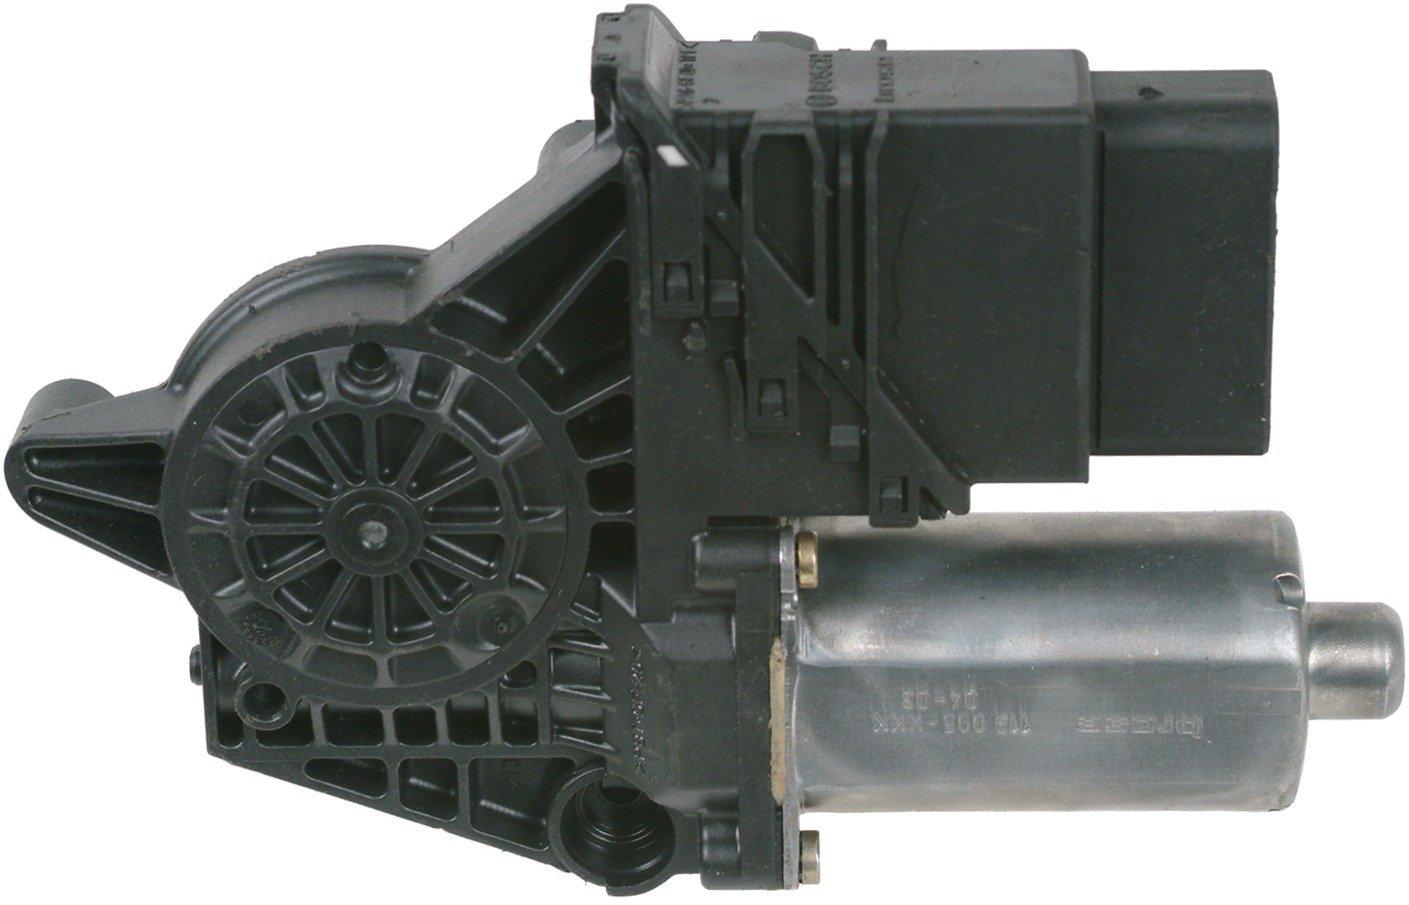 Cardone 47-2036 Remanufactured Import Window Lift Motor A1 Cardone A1  47-2036